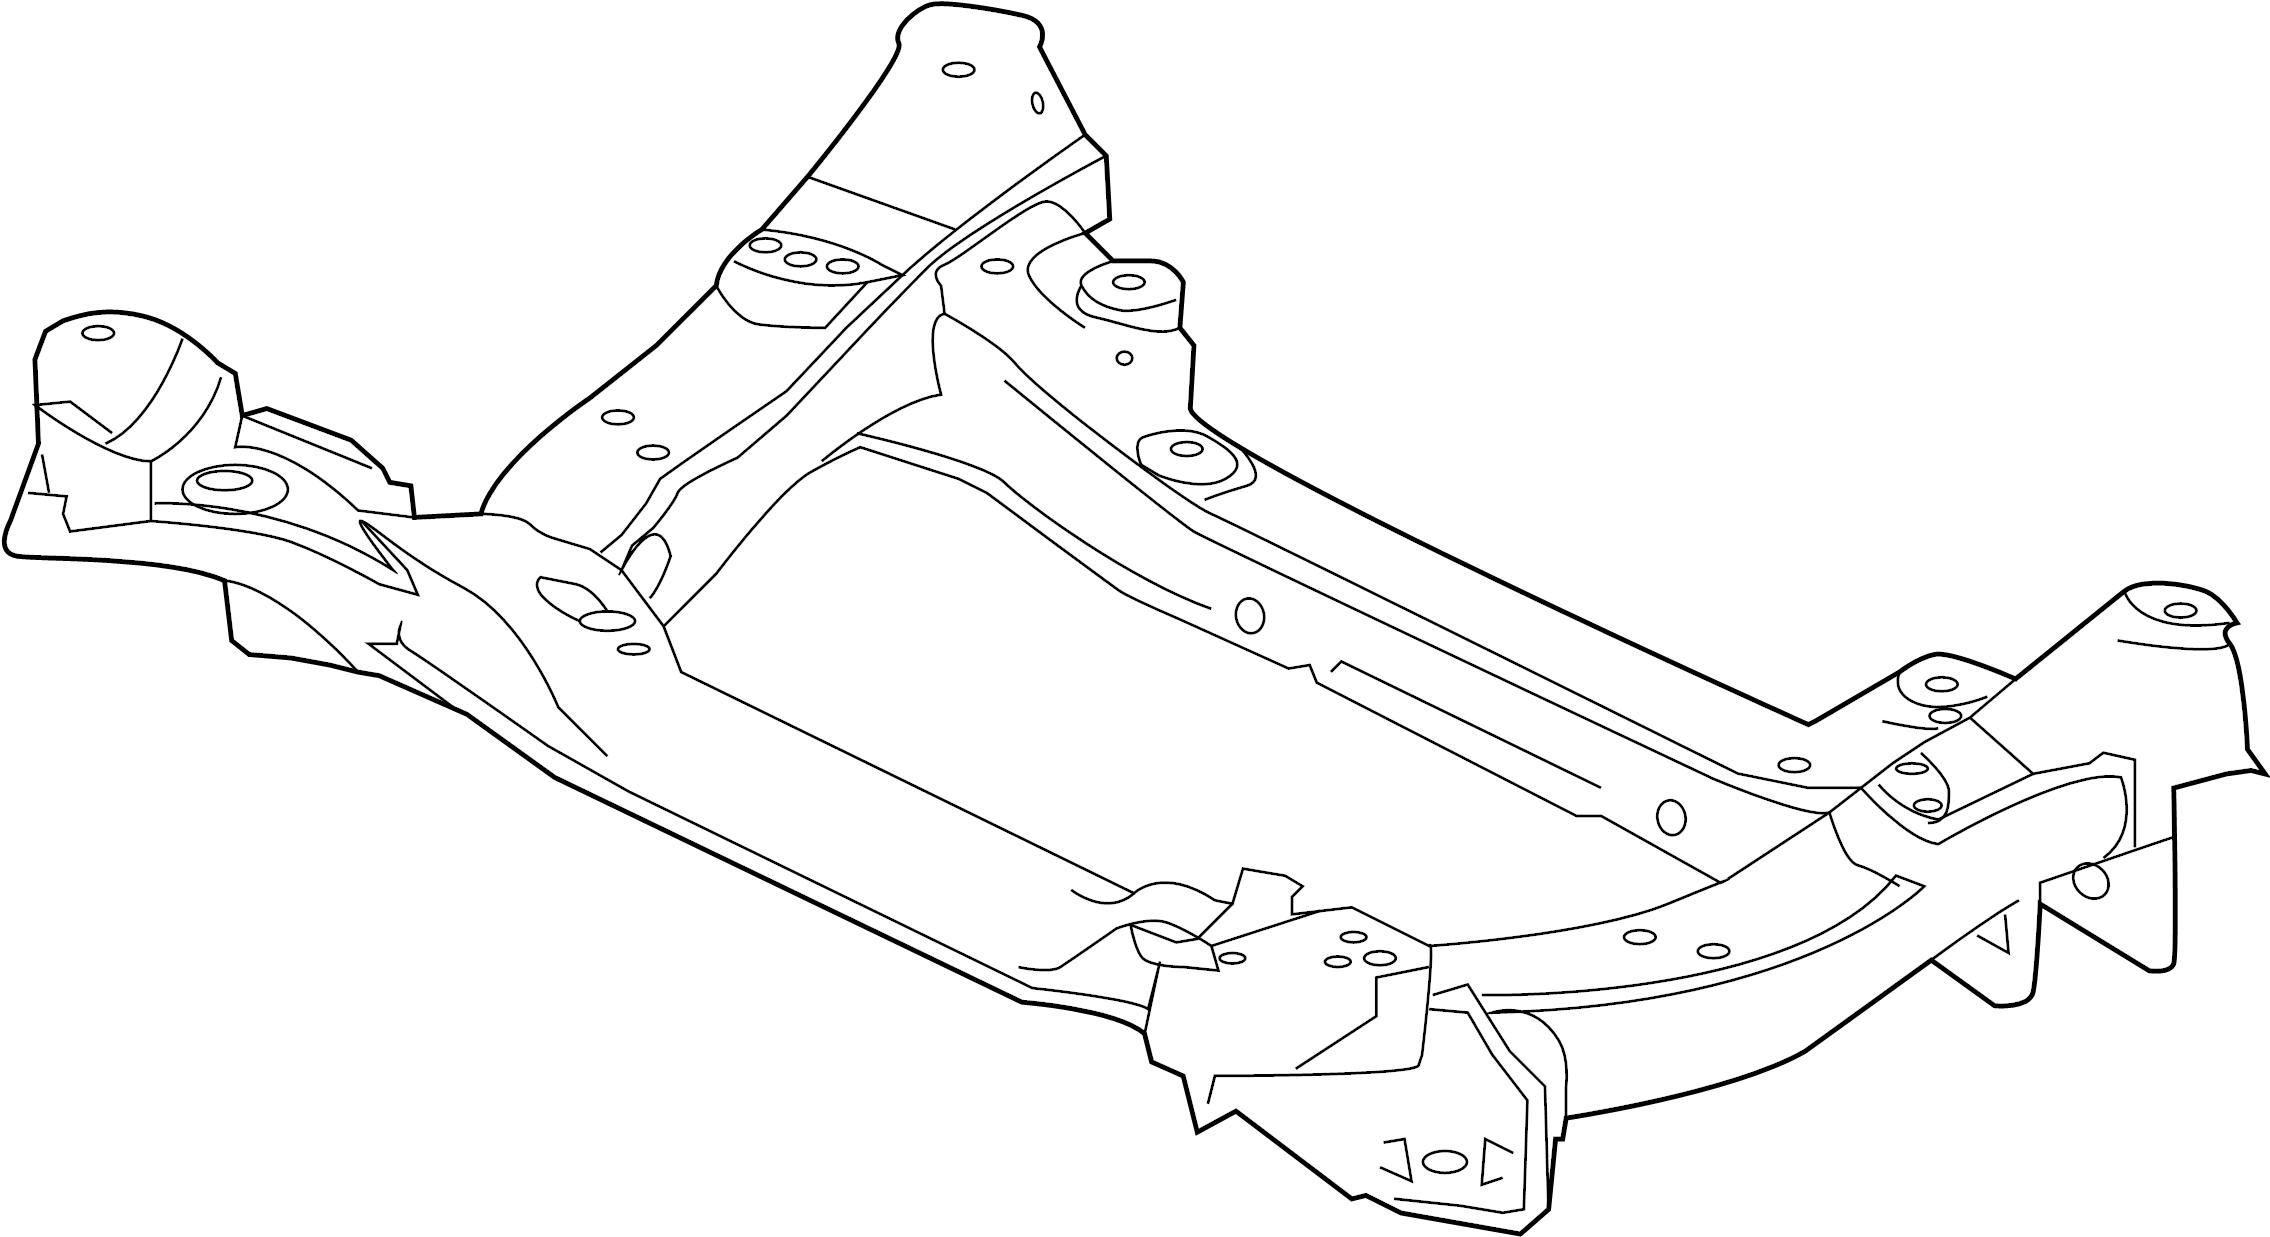 Jaguar Xfr Engine Cradle Suspension Front